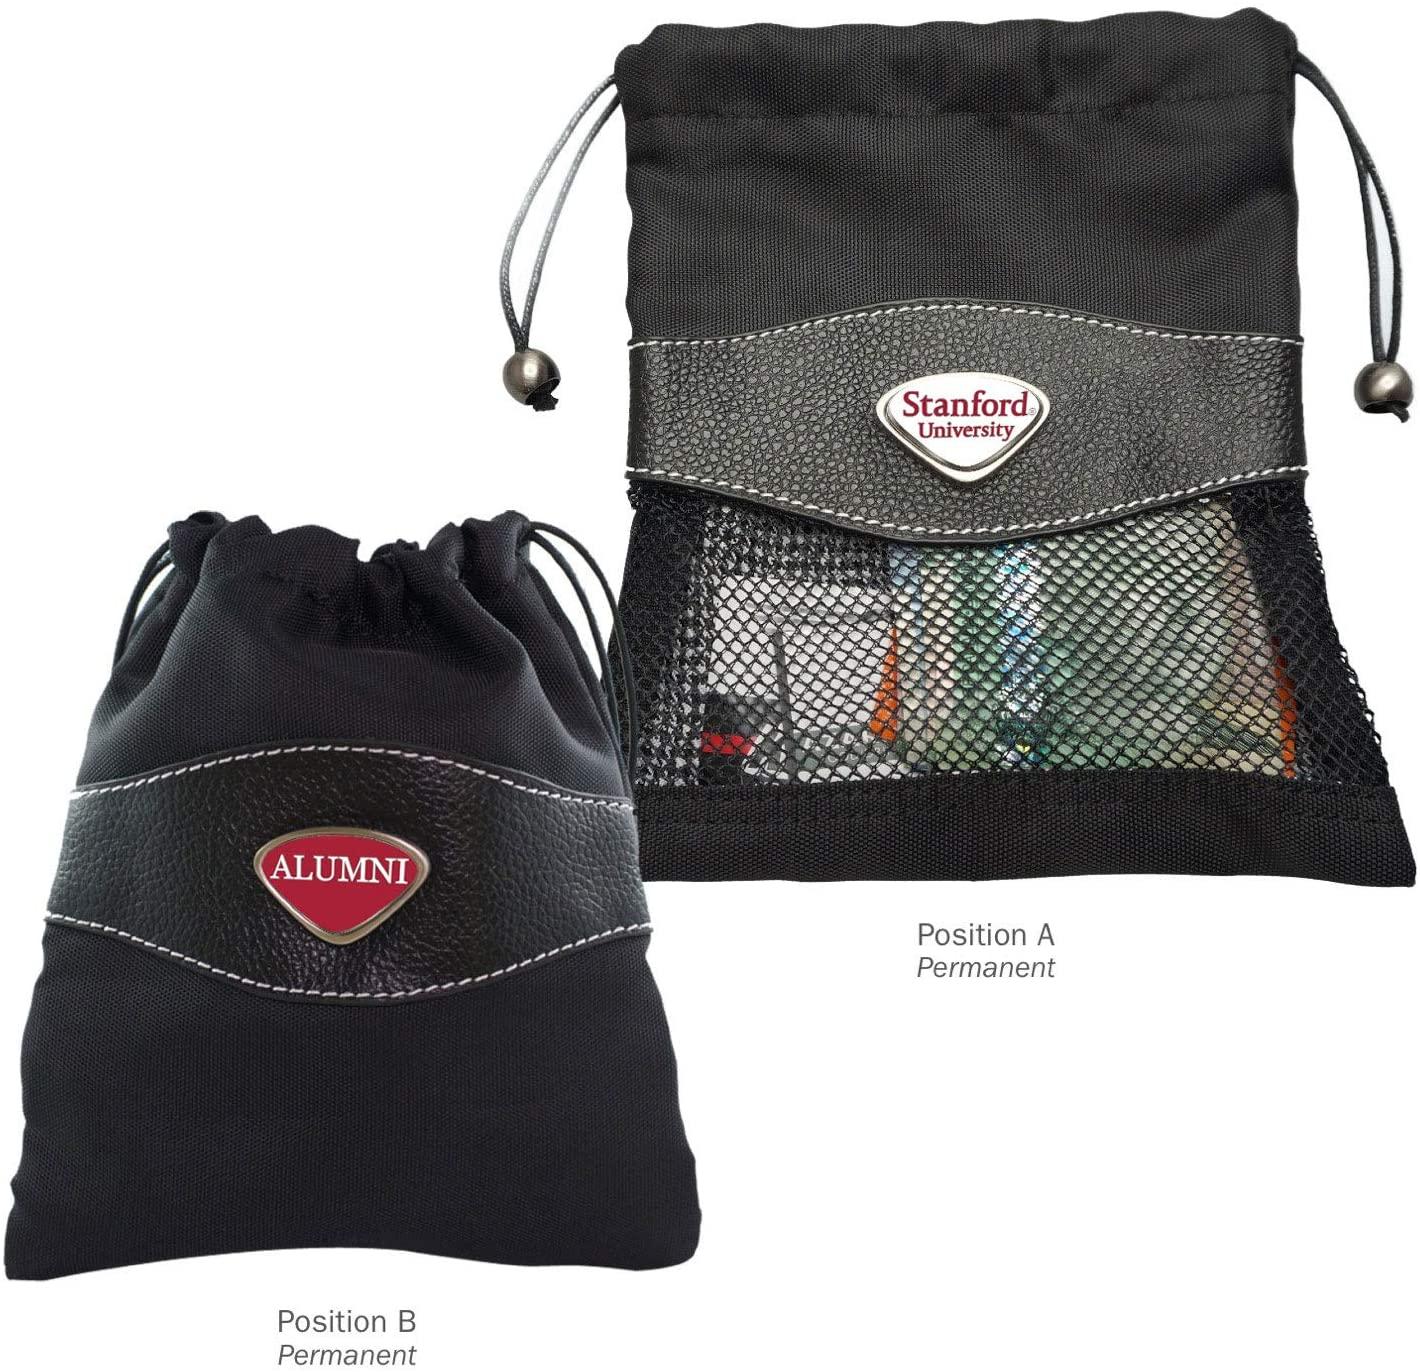 AdSpec NCAA Stanford Cardinal Collegiate Valuables BagCollegiate Valuables Bag, Black, One Size